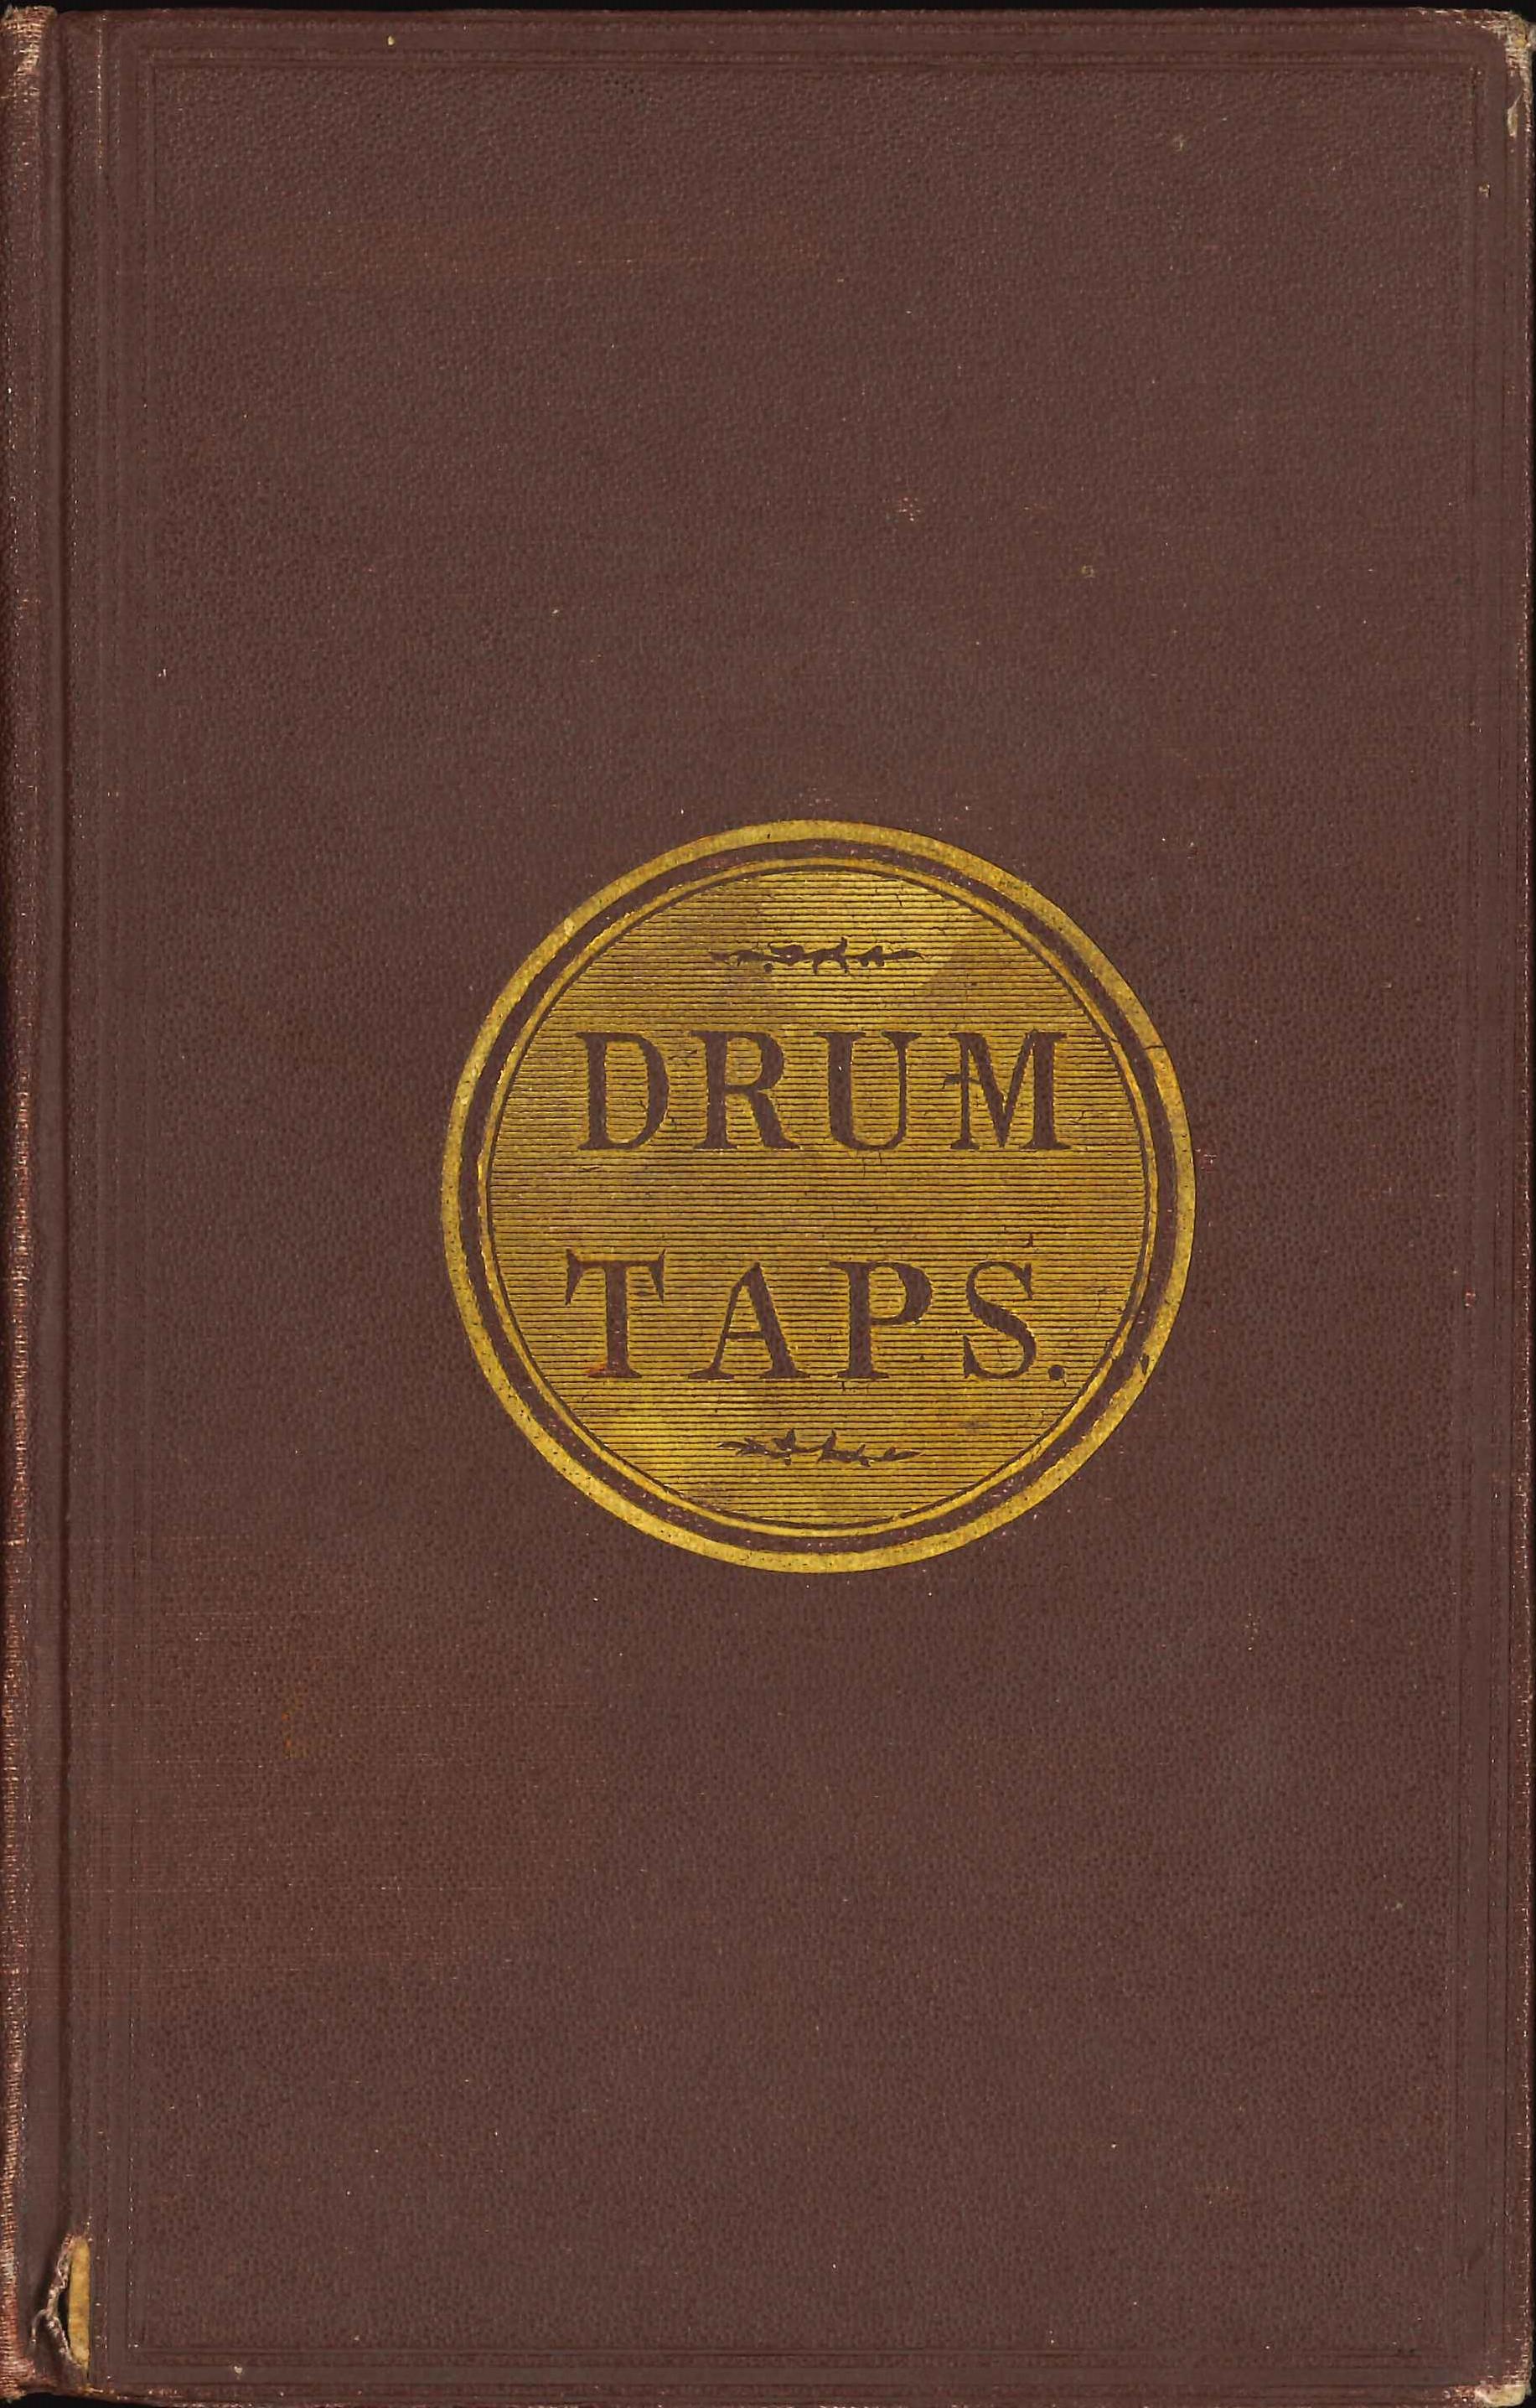 Walt Whitman. Walt Whitman's Drum-Taps. New York, 1865.